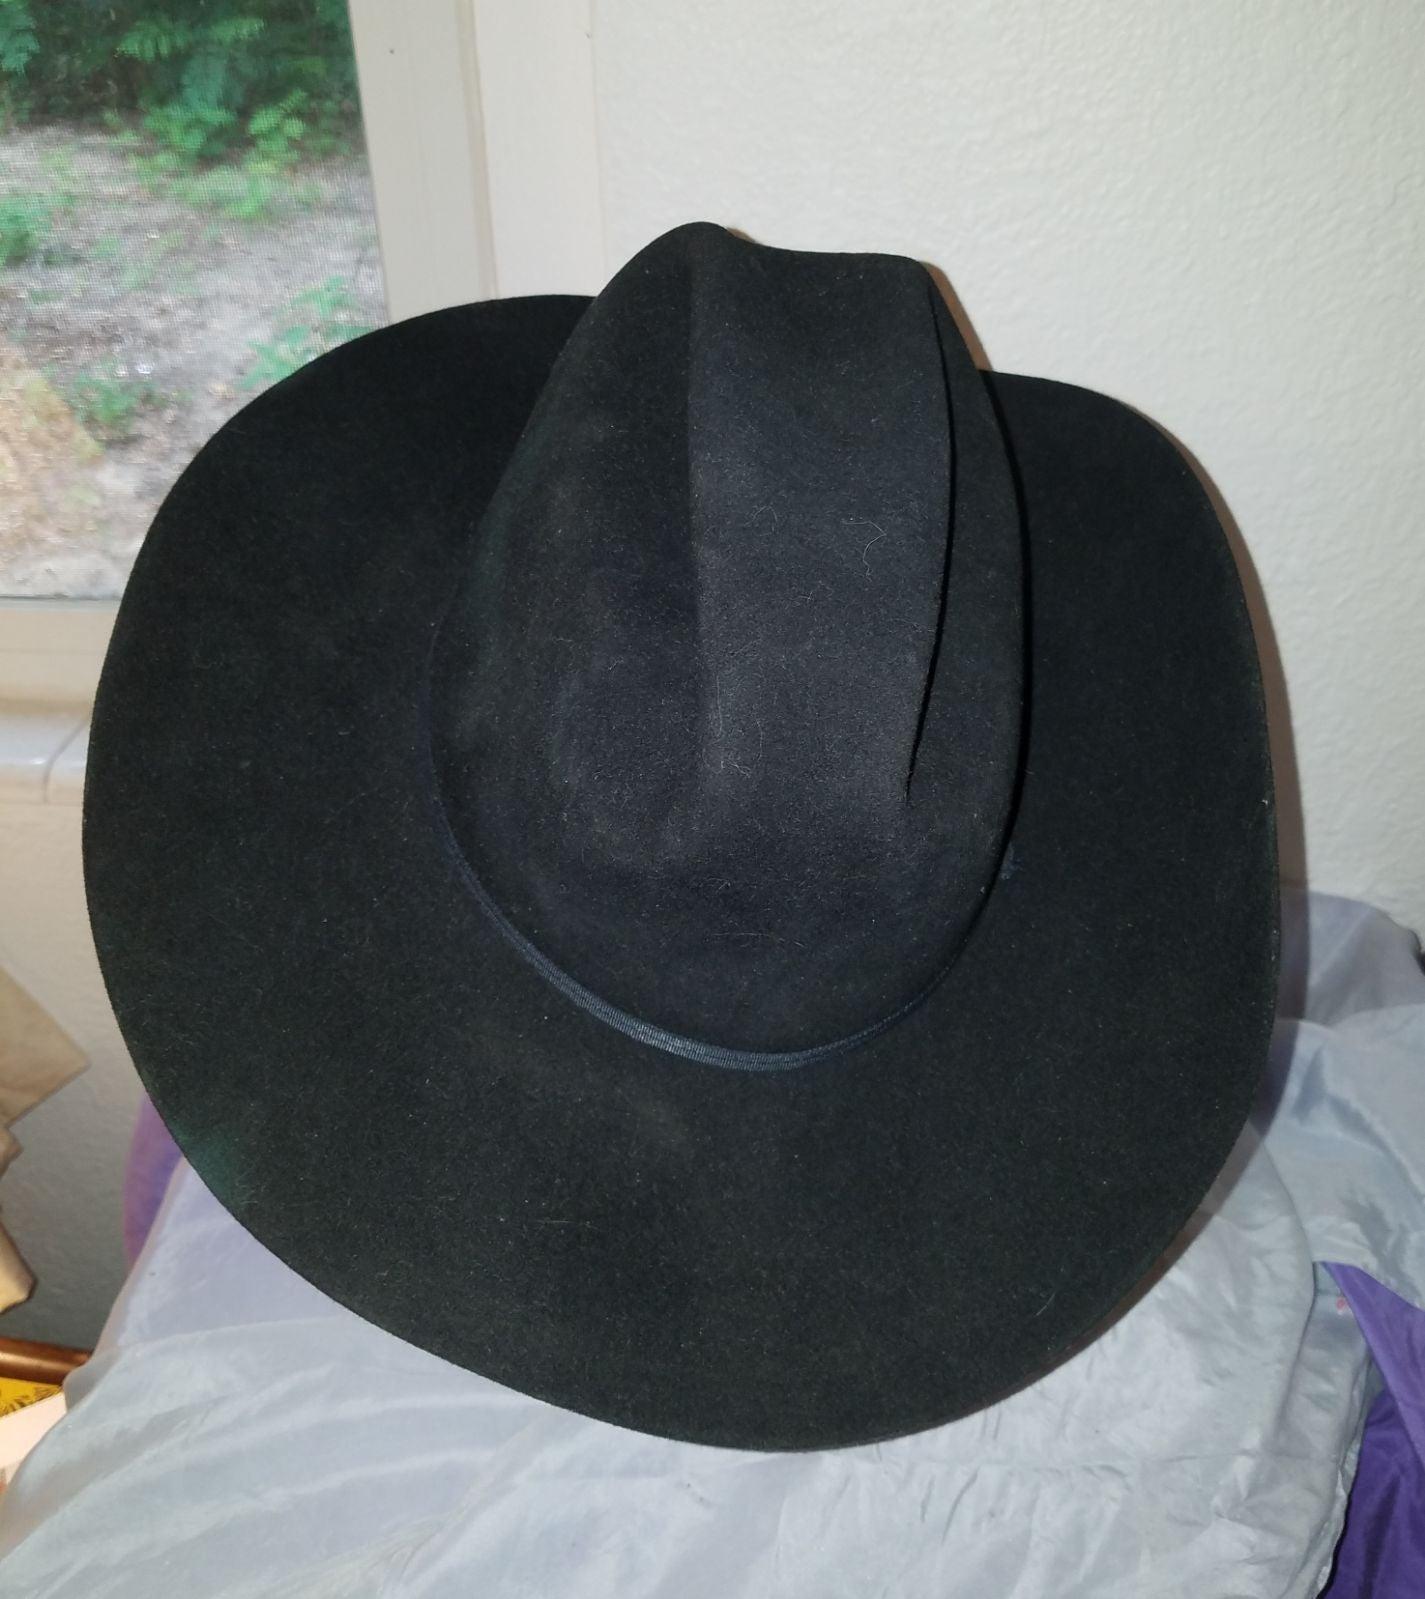 Eddy Black Vintage Western Cowboy Hat